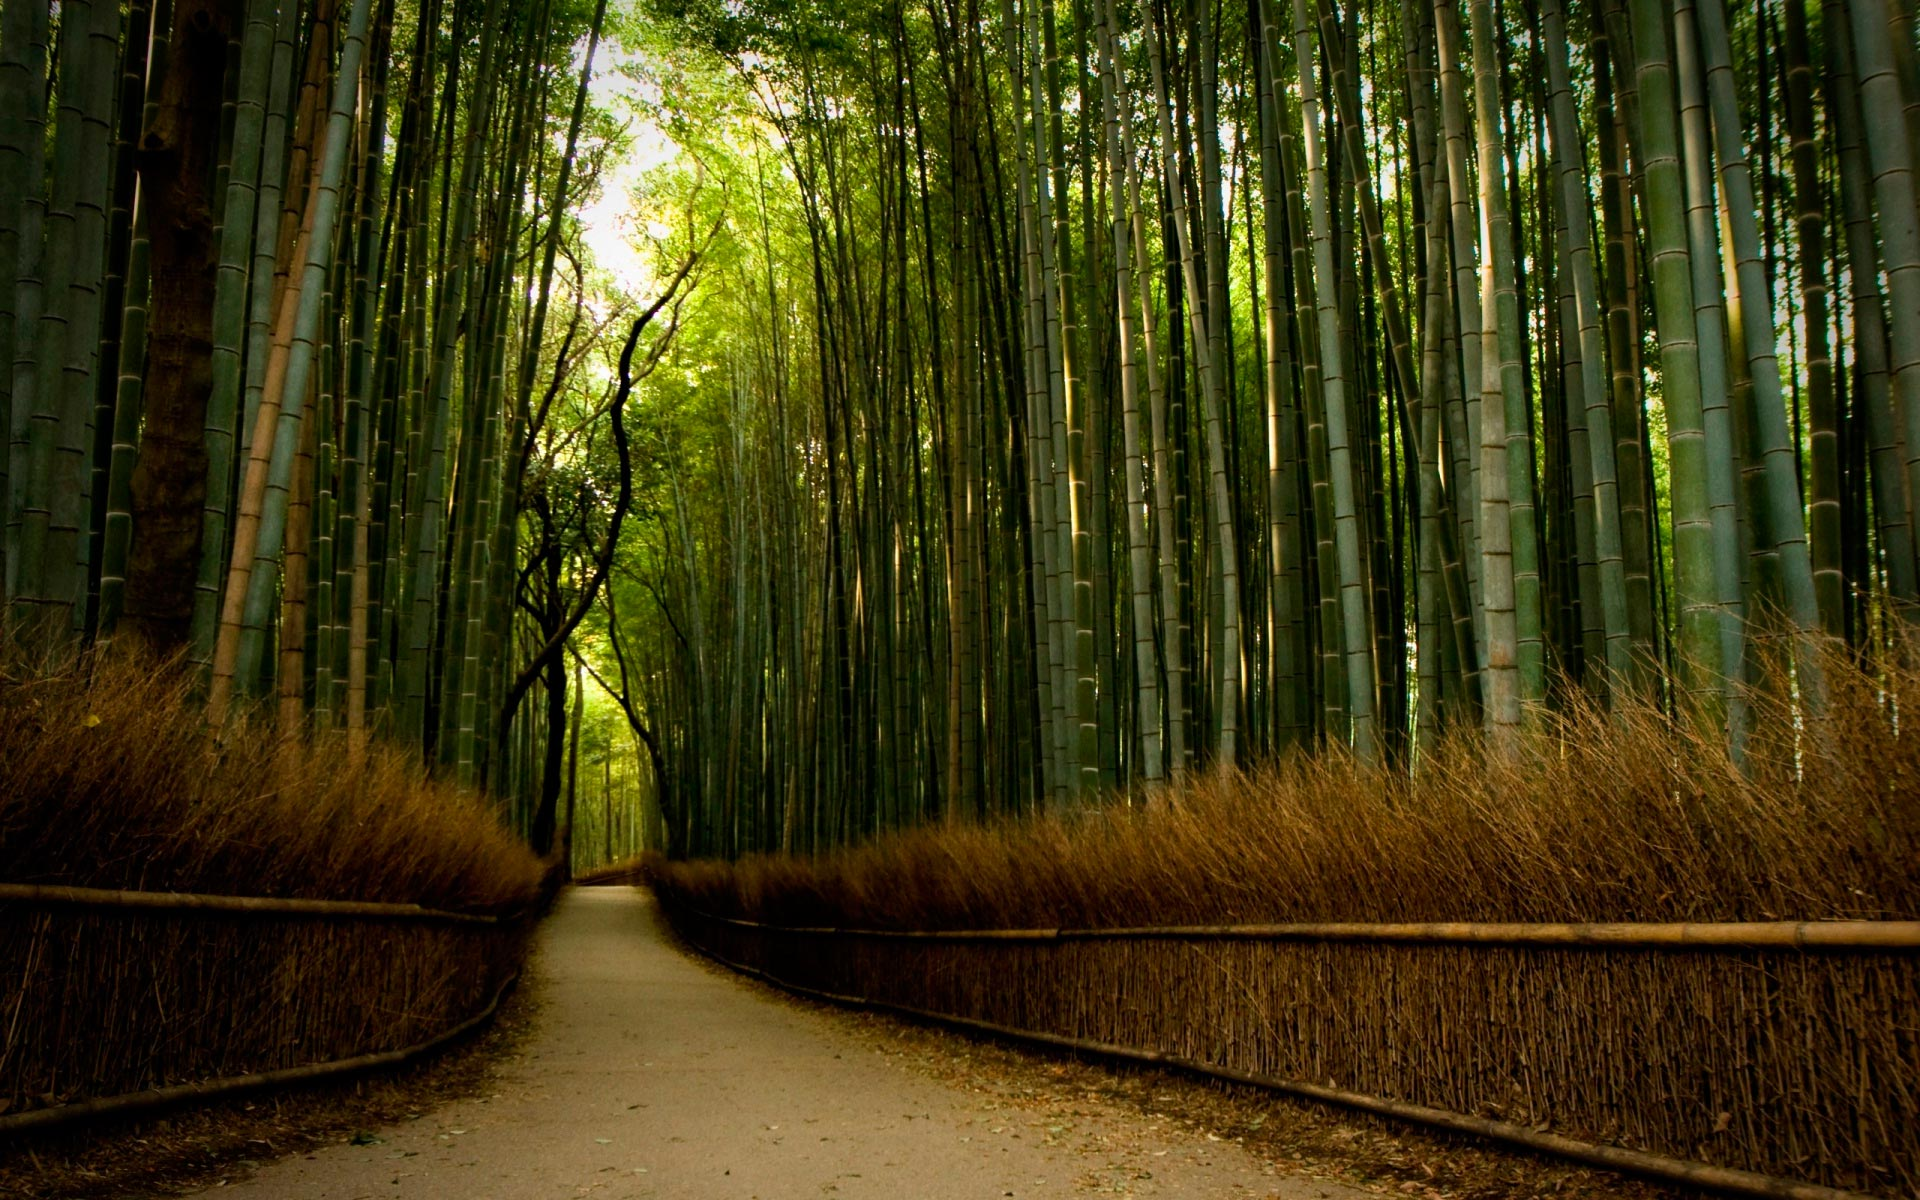 Лес дорога через бамбуковый лес